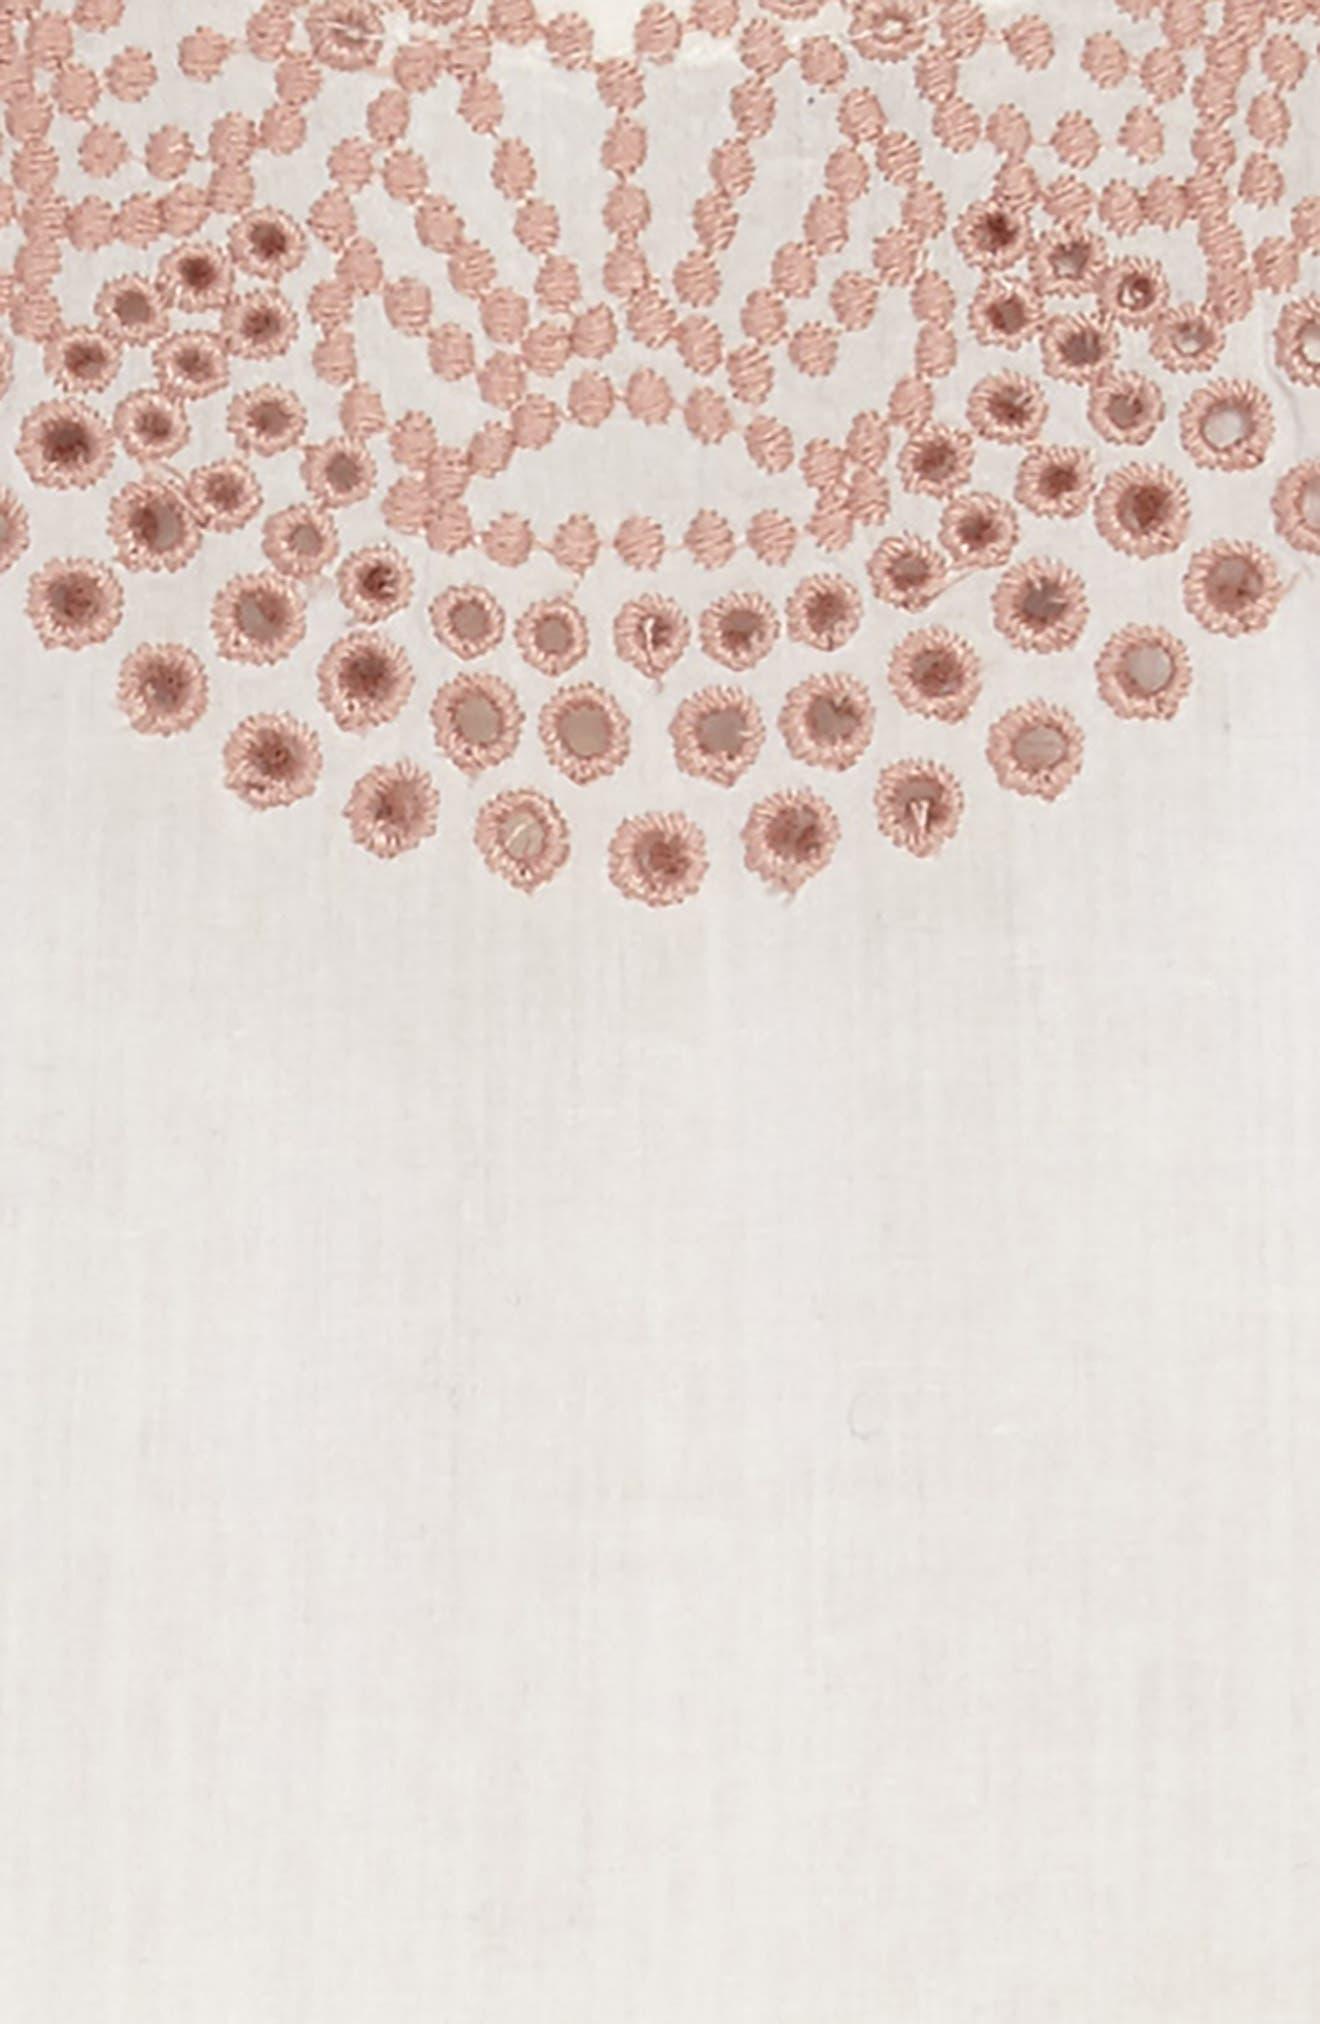 STELLA MCCARTNEY,                             Embroidered Sleeveless Dress,                             Alternate thumbnail 3, color,                             900